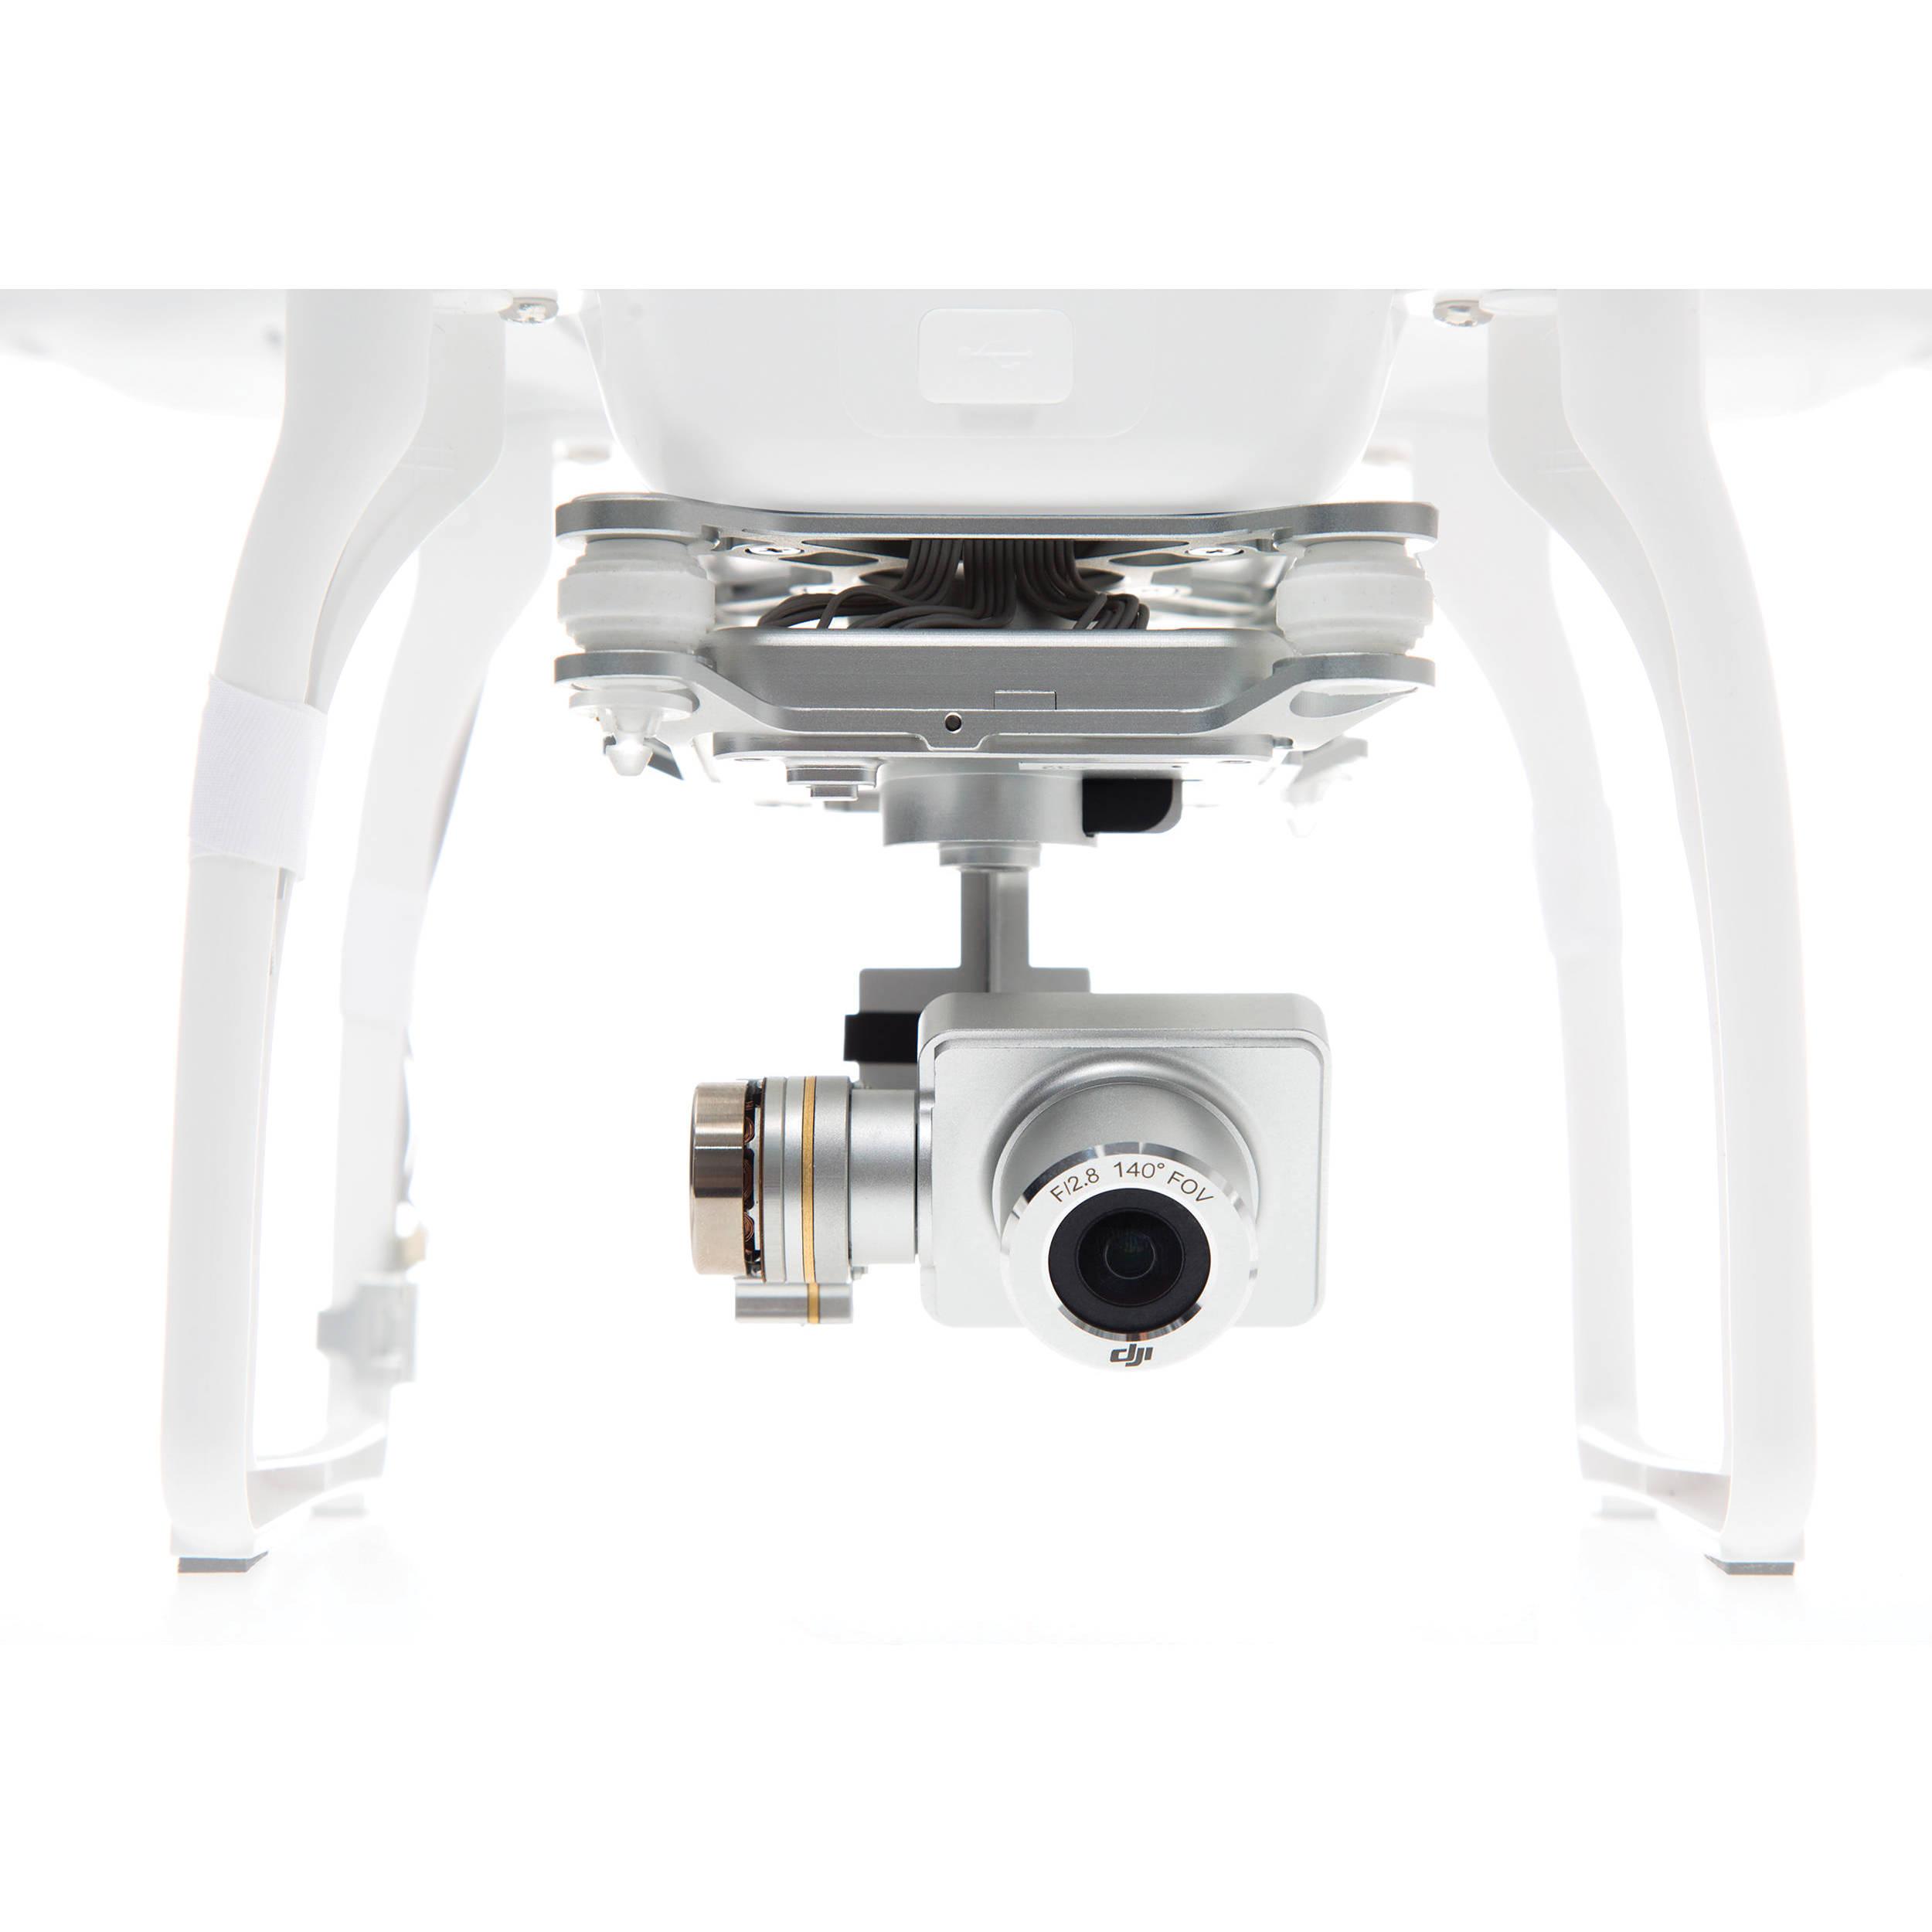 Dji phantom 2 камерами характеристики x series цена, инструкция, комплектация